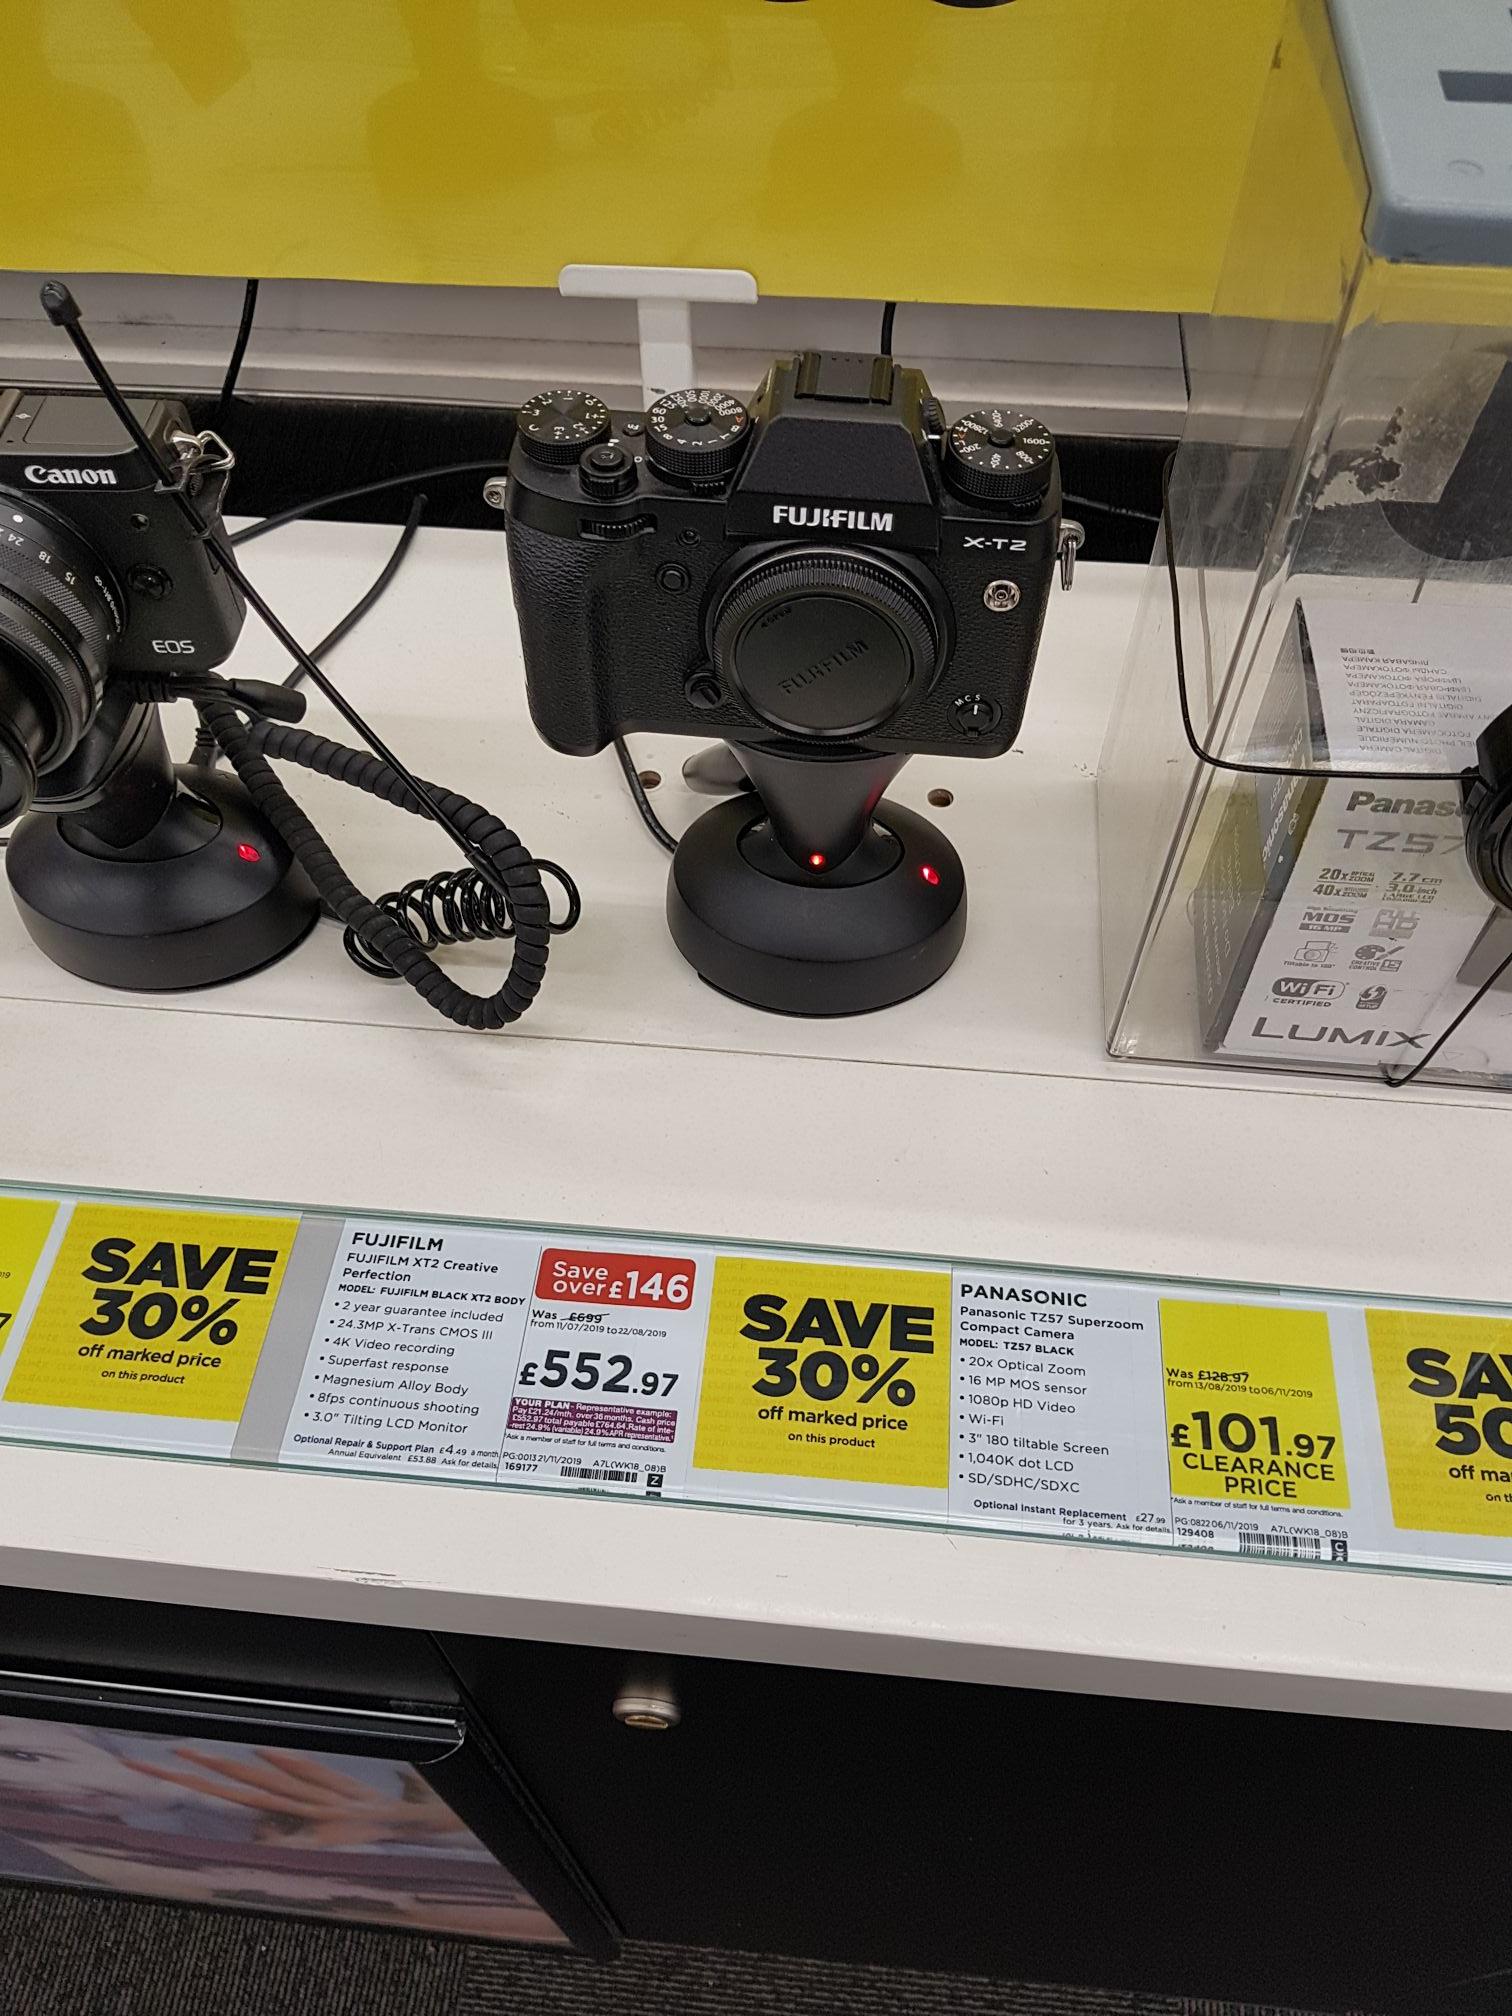 FUJIFILM XT-2 Camera £552.97 @ Currys PC WorldFosse Park, Leicester